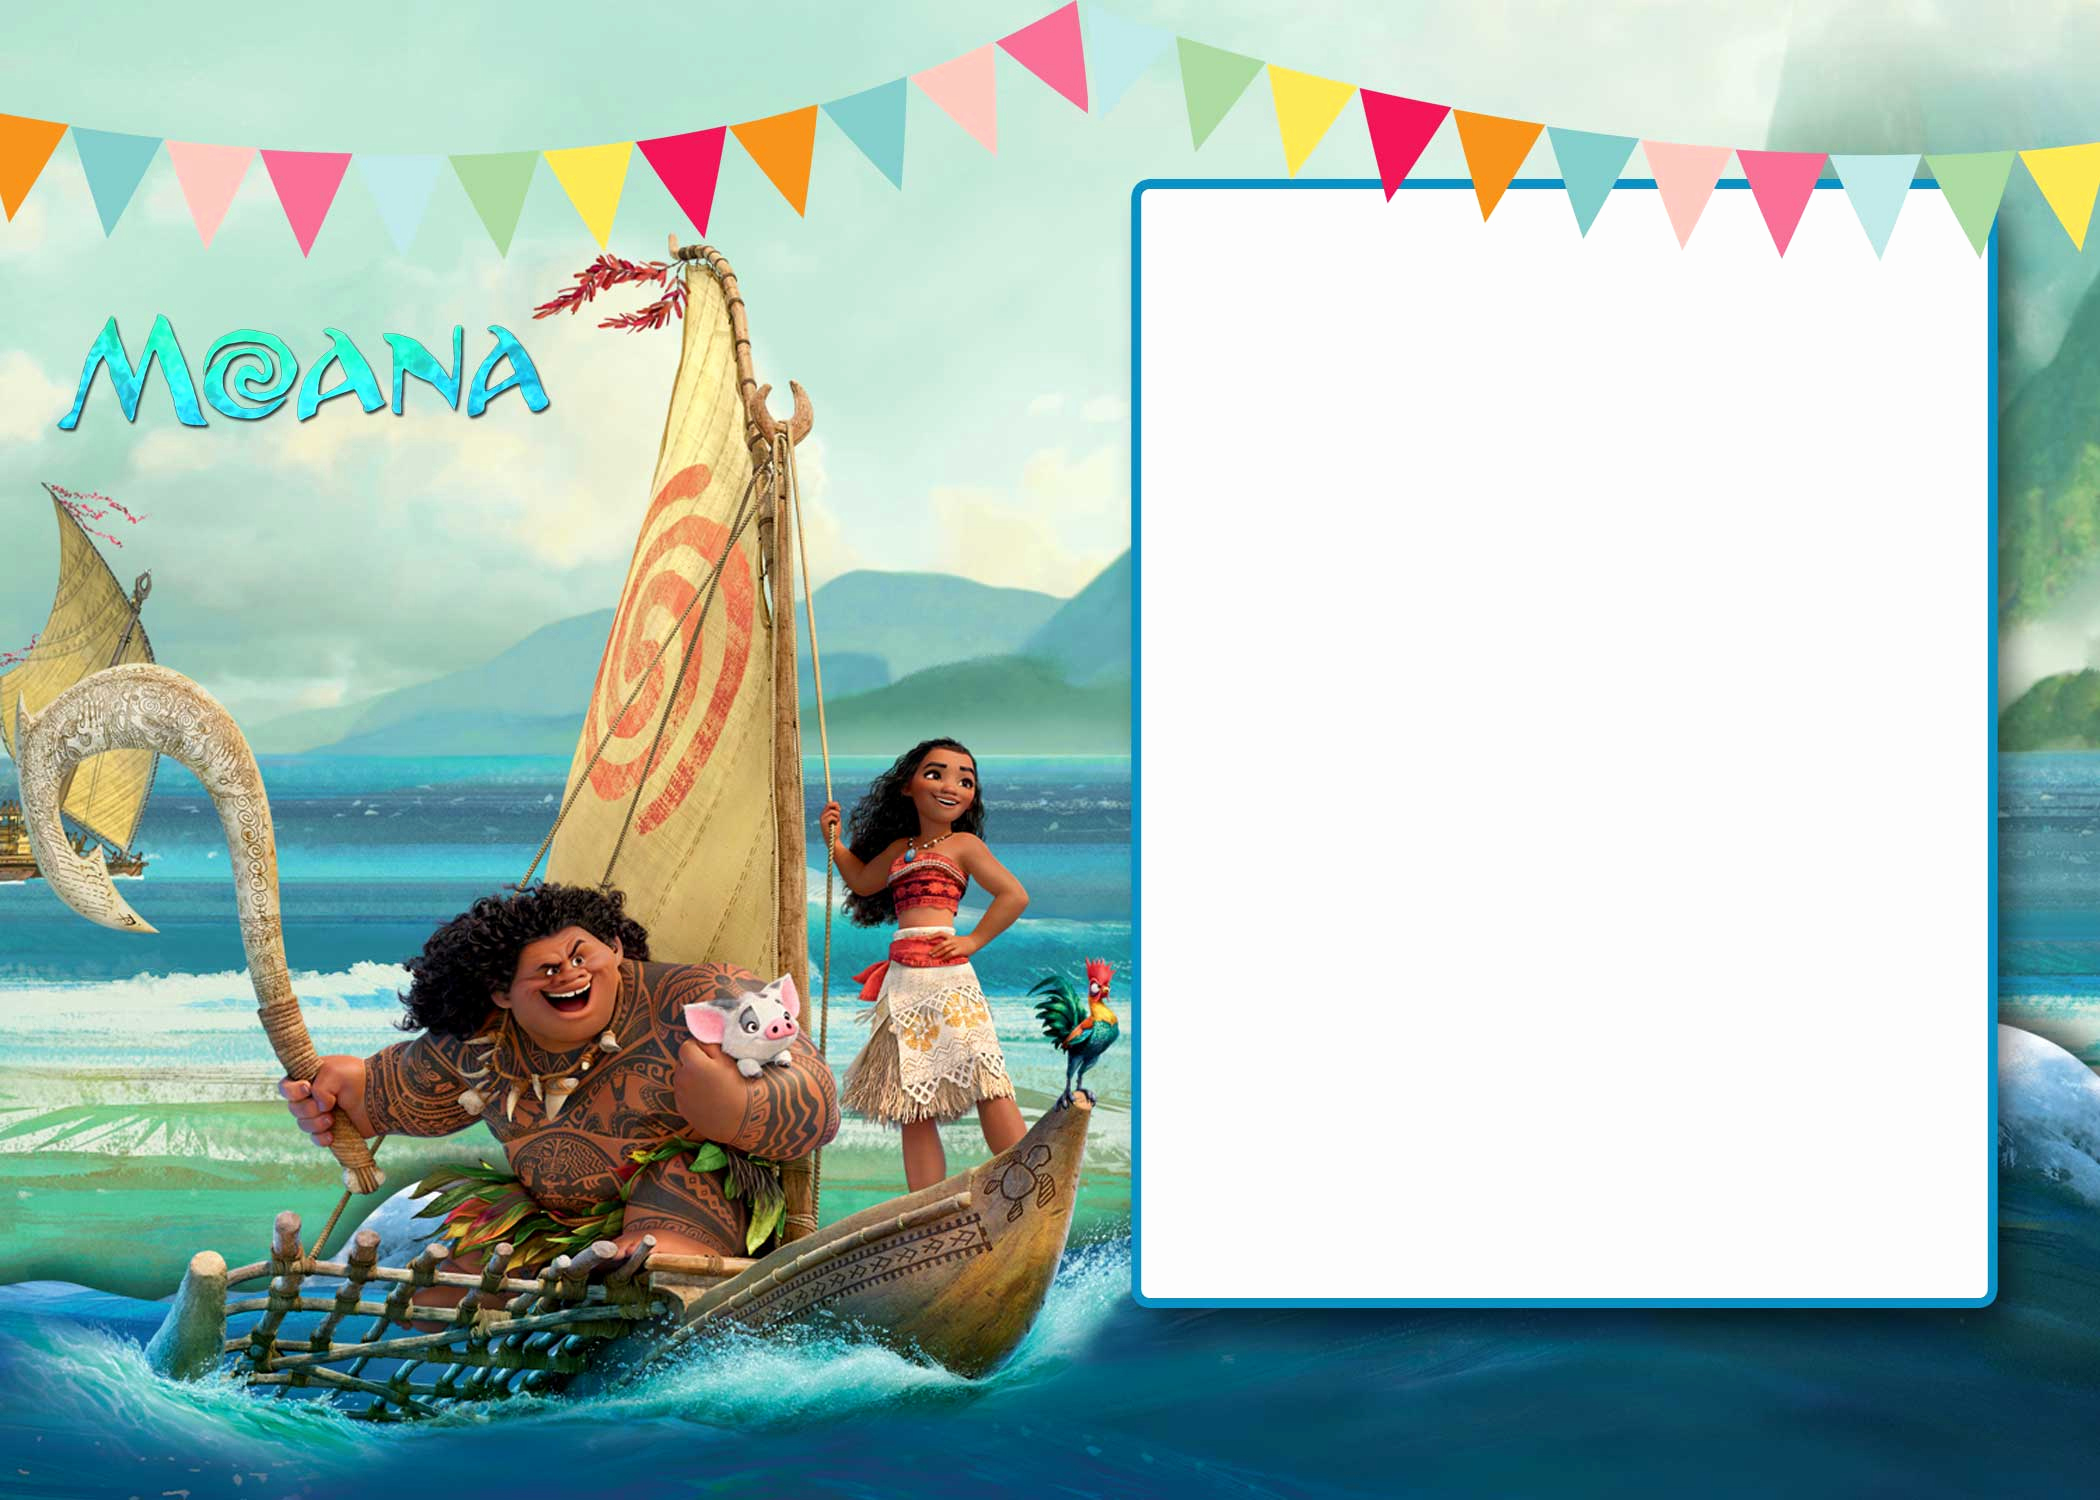 Moana Birthday Invitation Template Luxury Free Moana Baby Shower Invitation Template